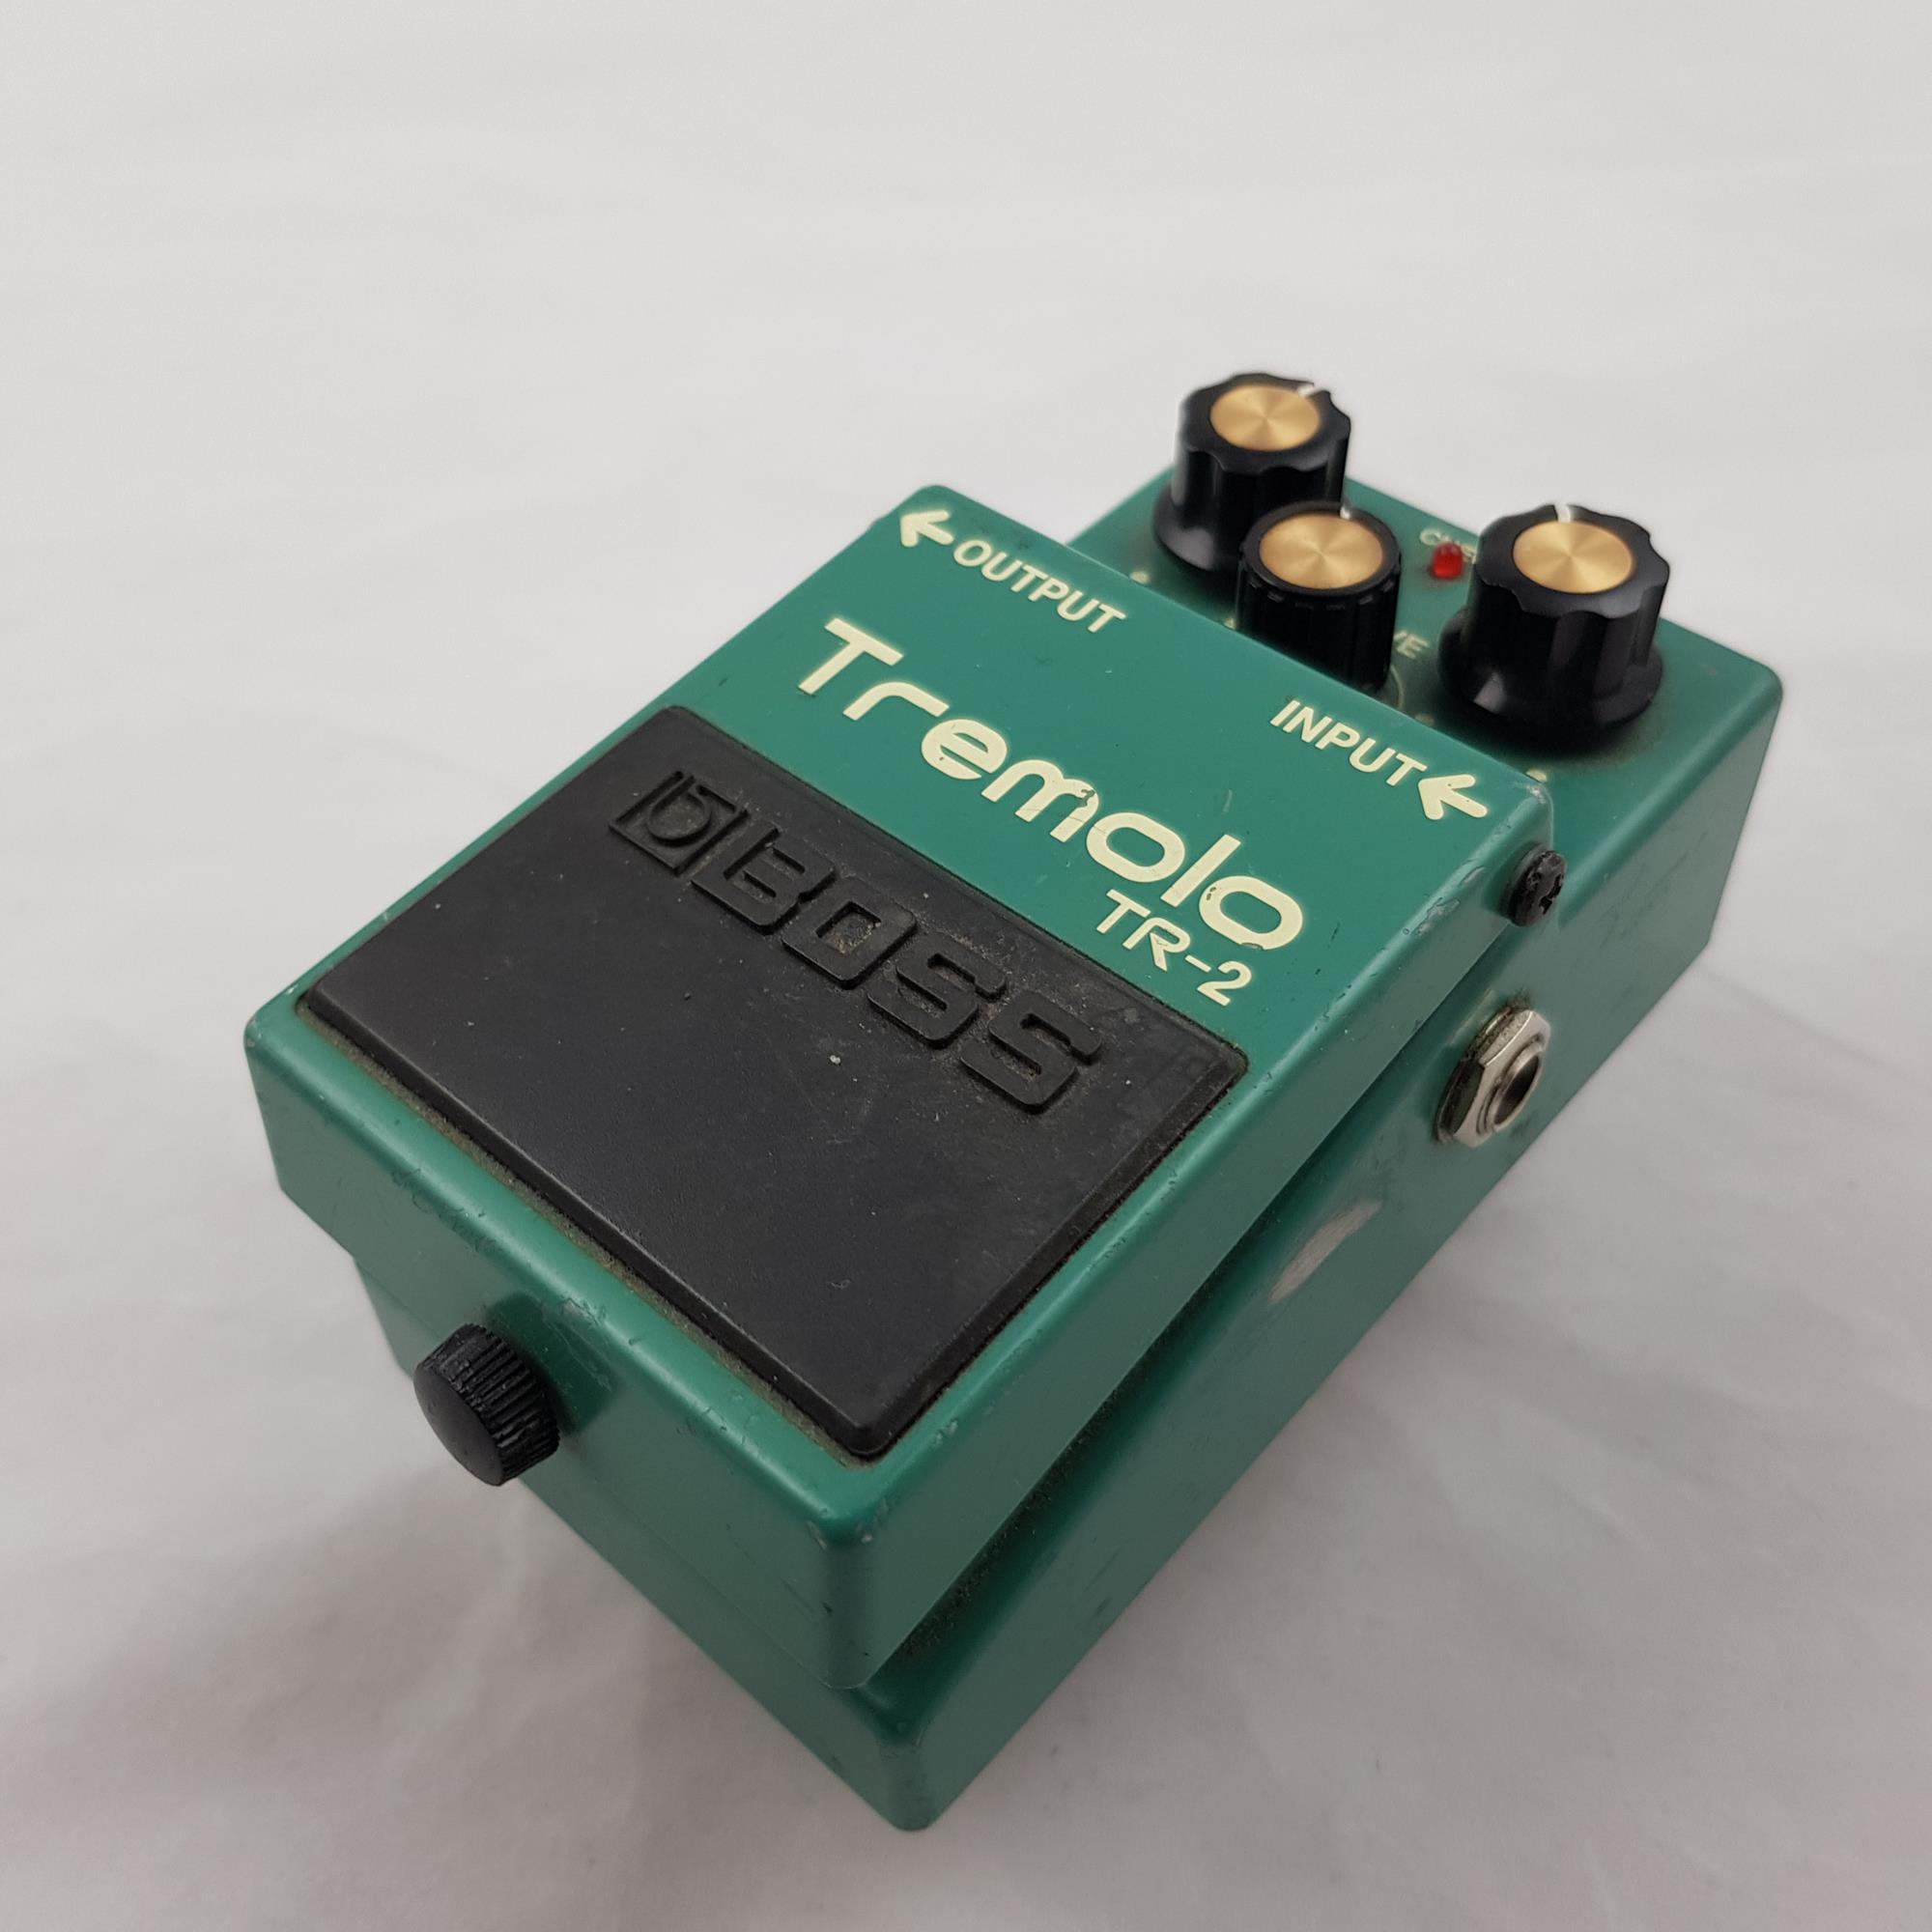 BOSS-TR-2-TREMOLO-sku-1602871402217